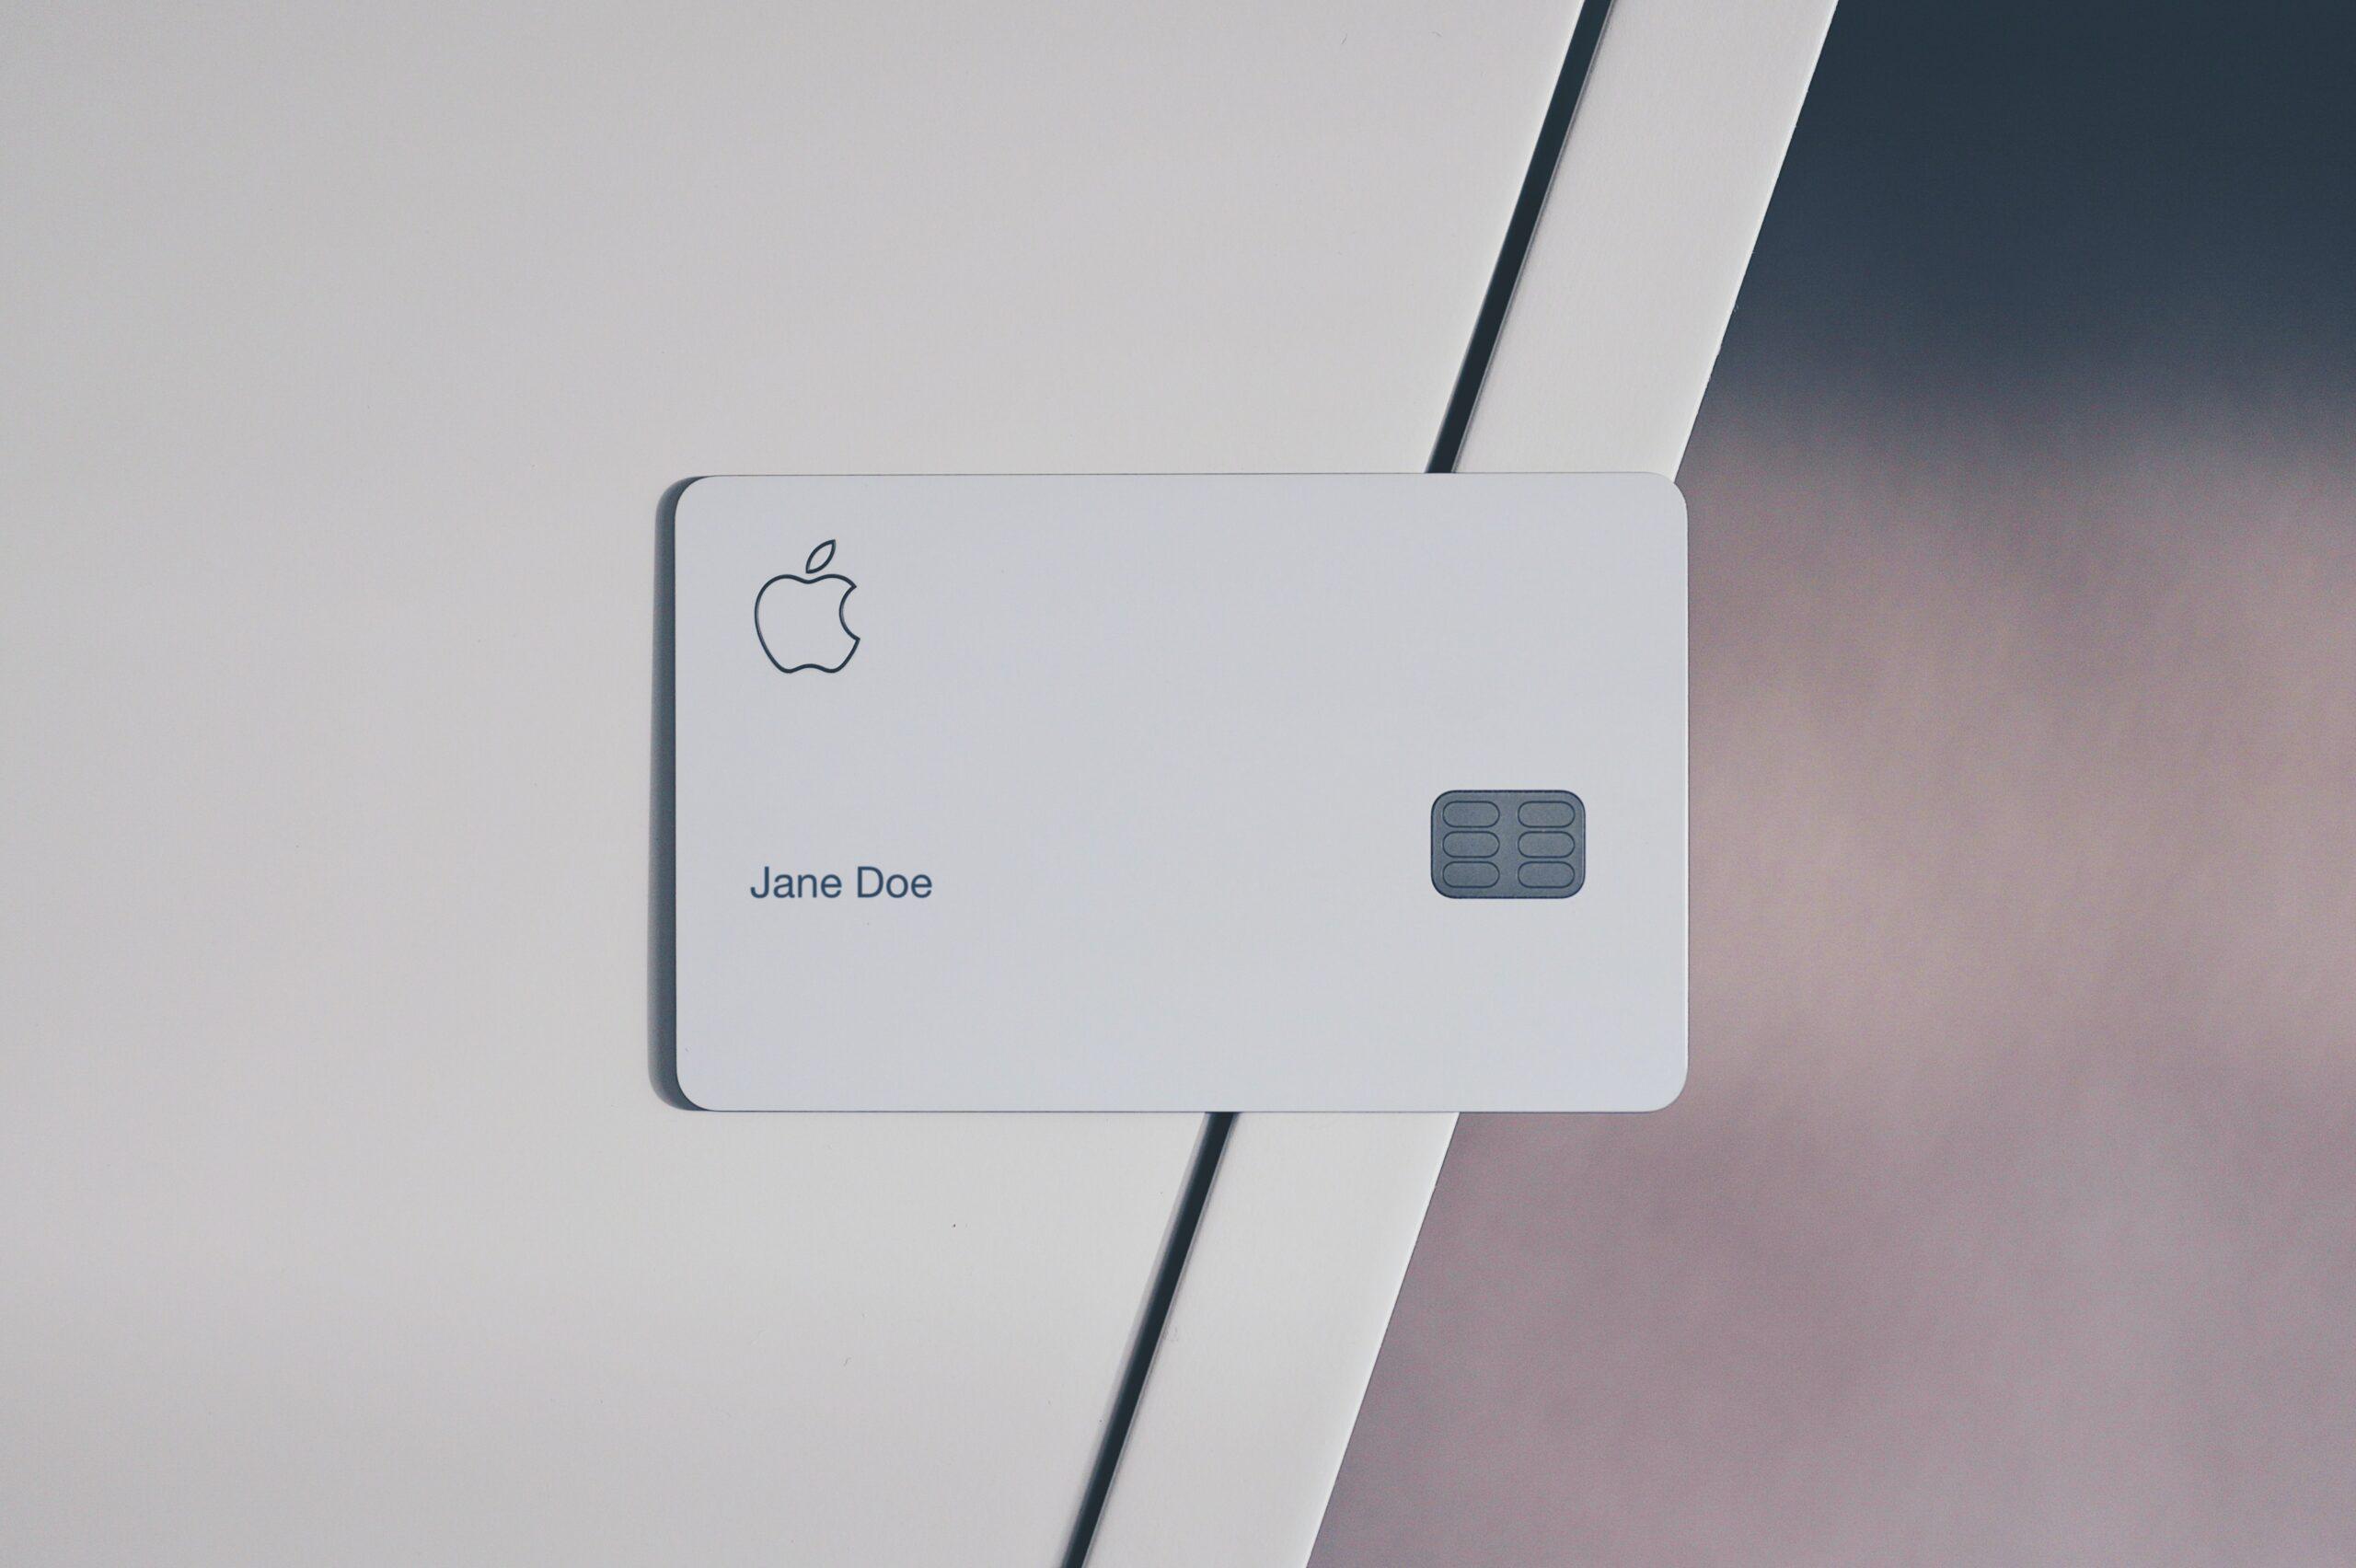 【SECRID】カードが飛び出すコンパクトな革財布